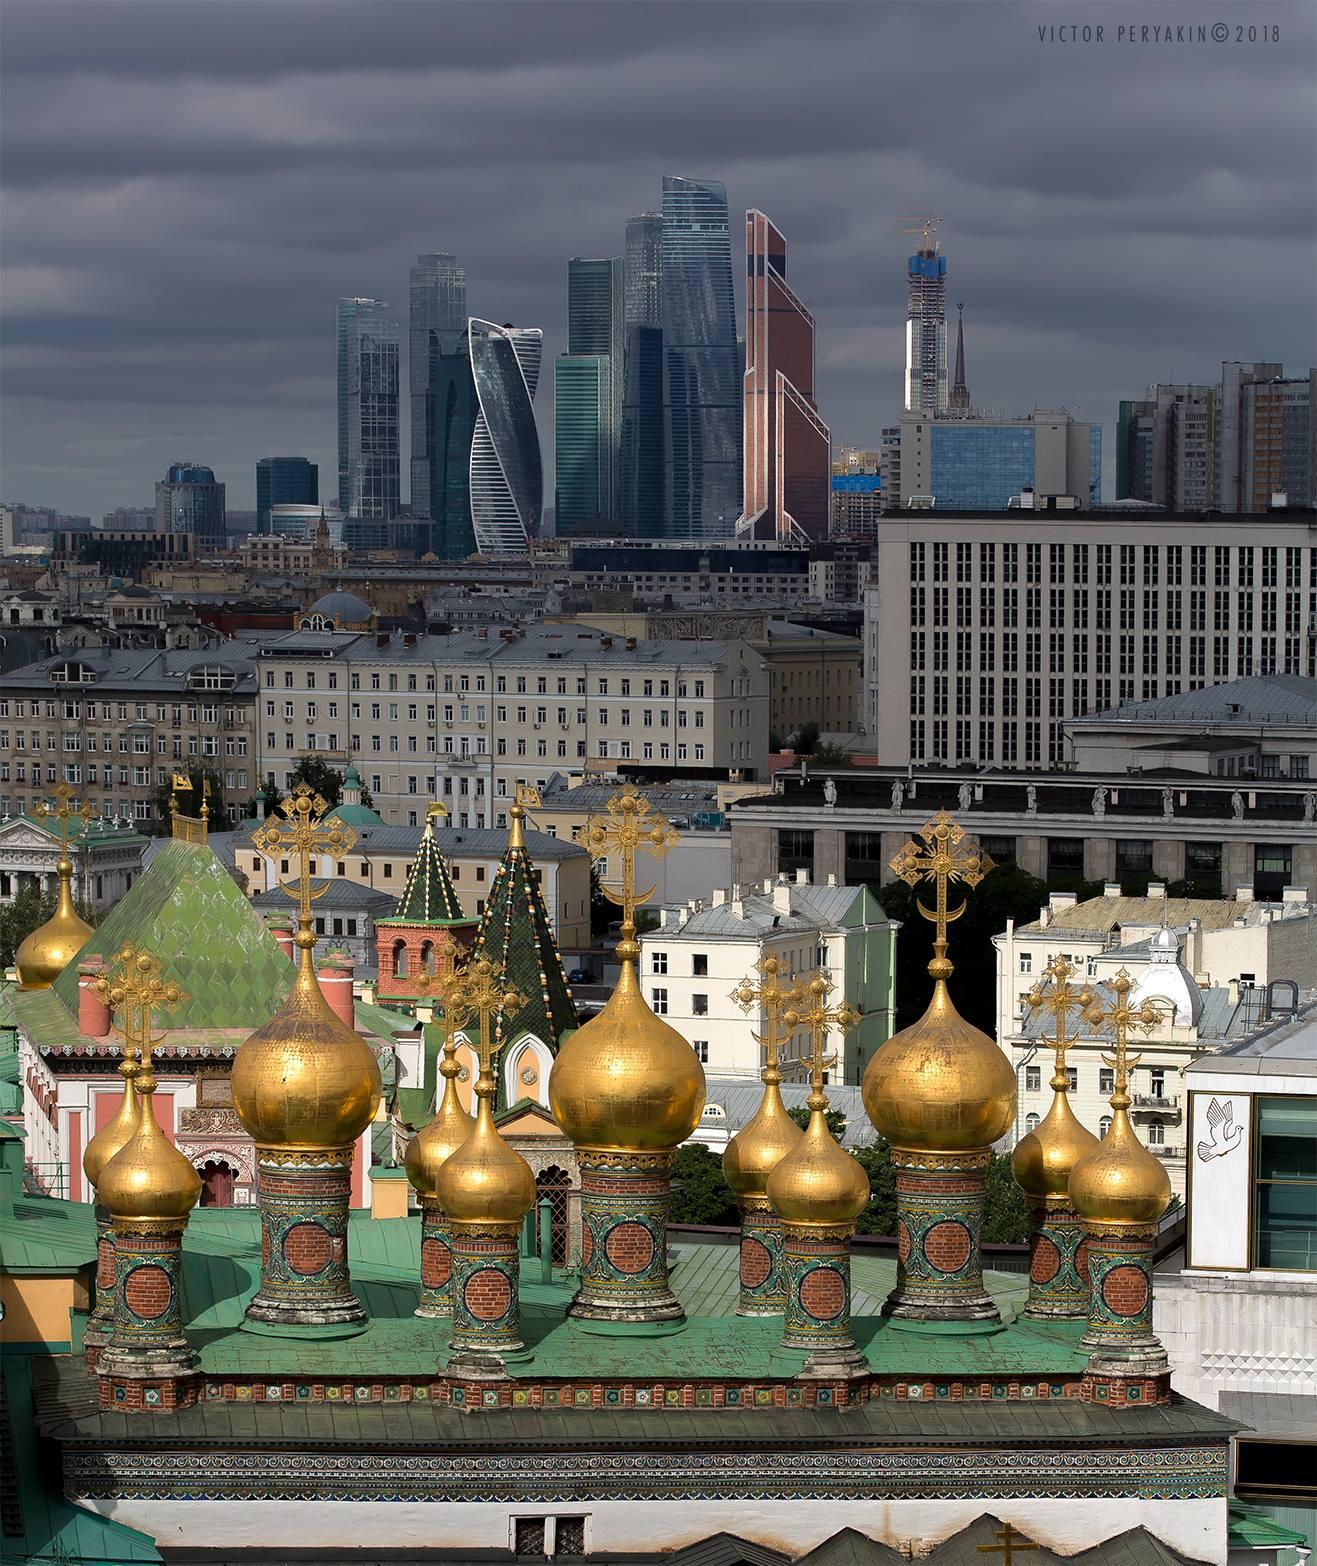 москва город архитектура, Виктор Перякин